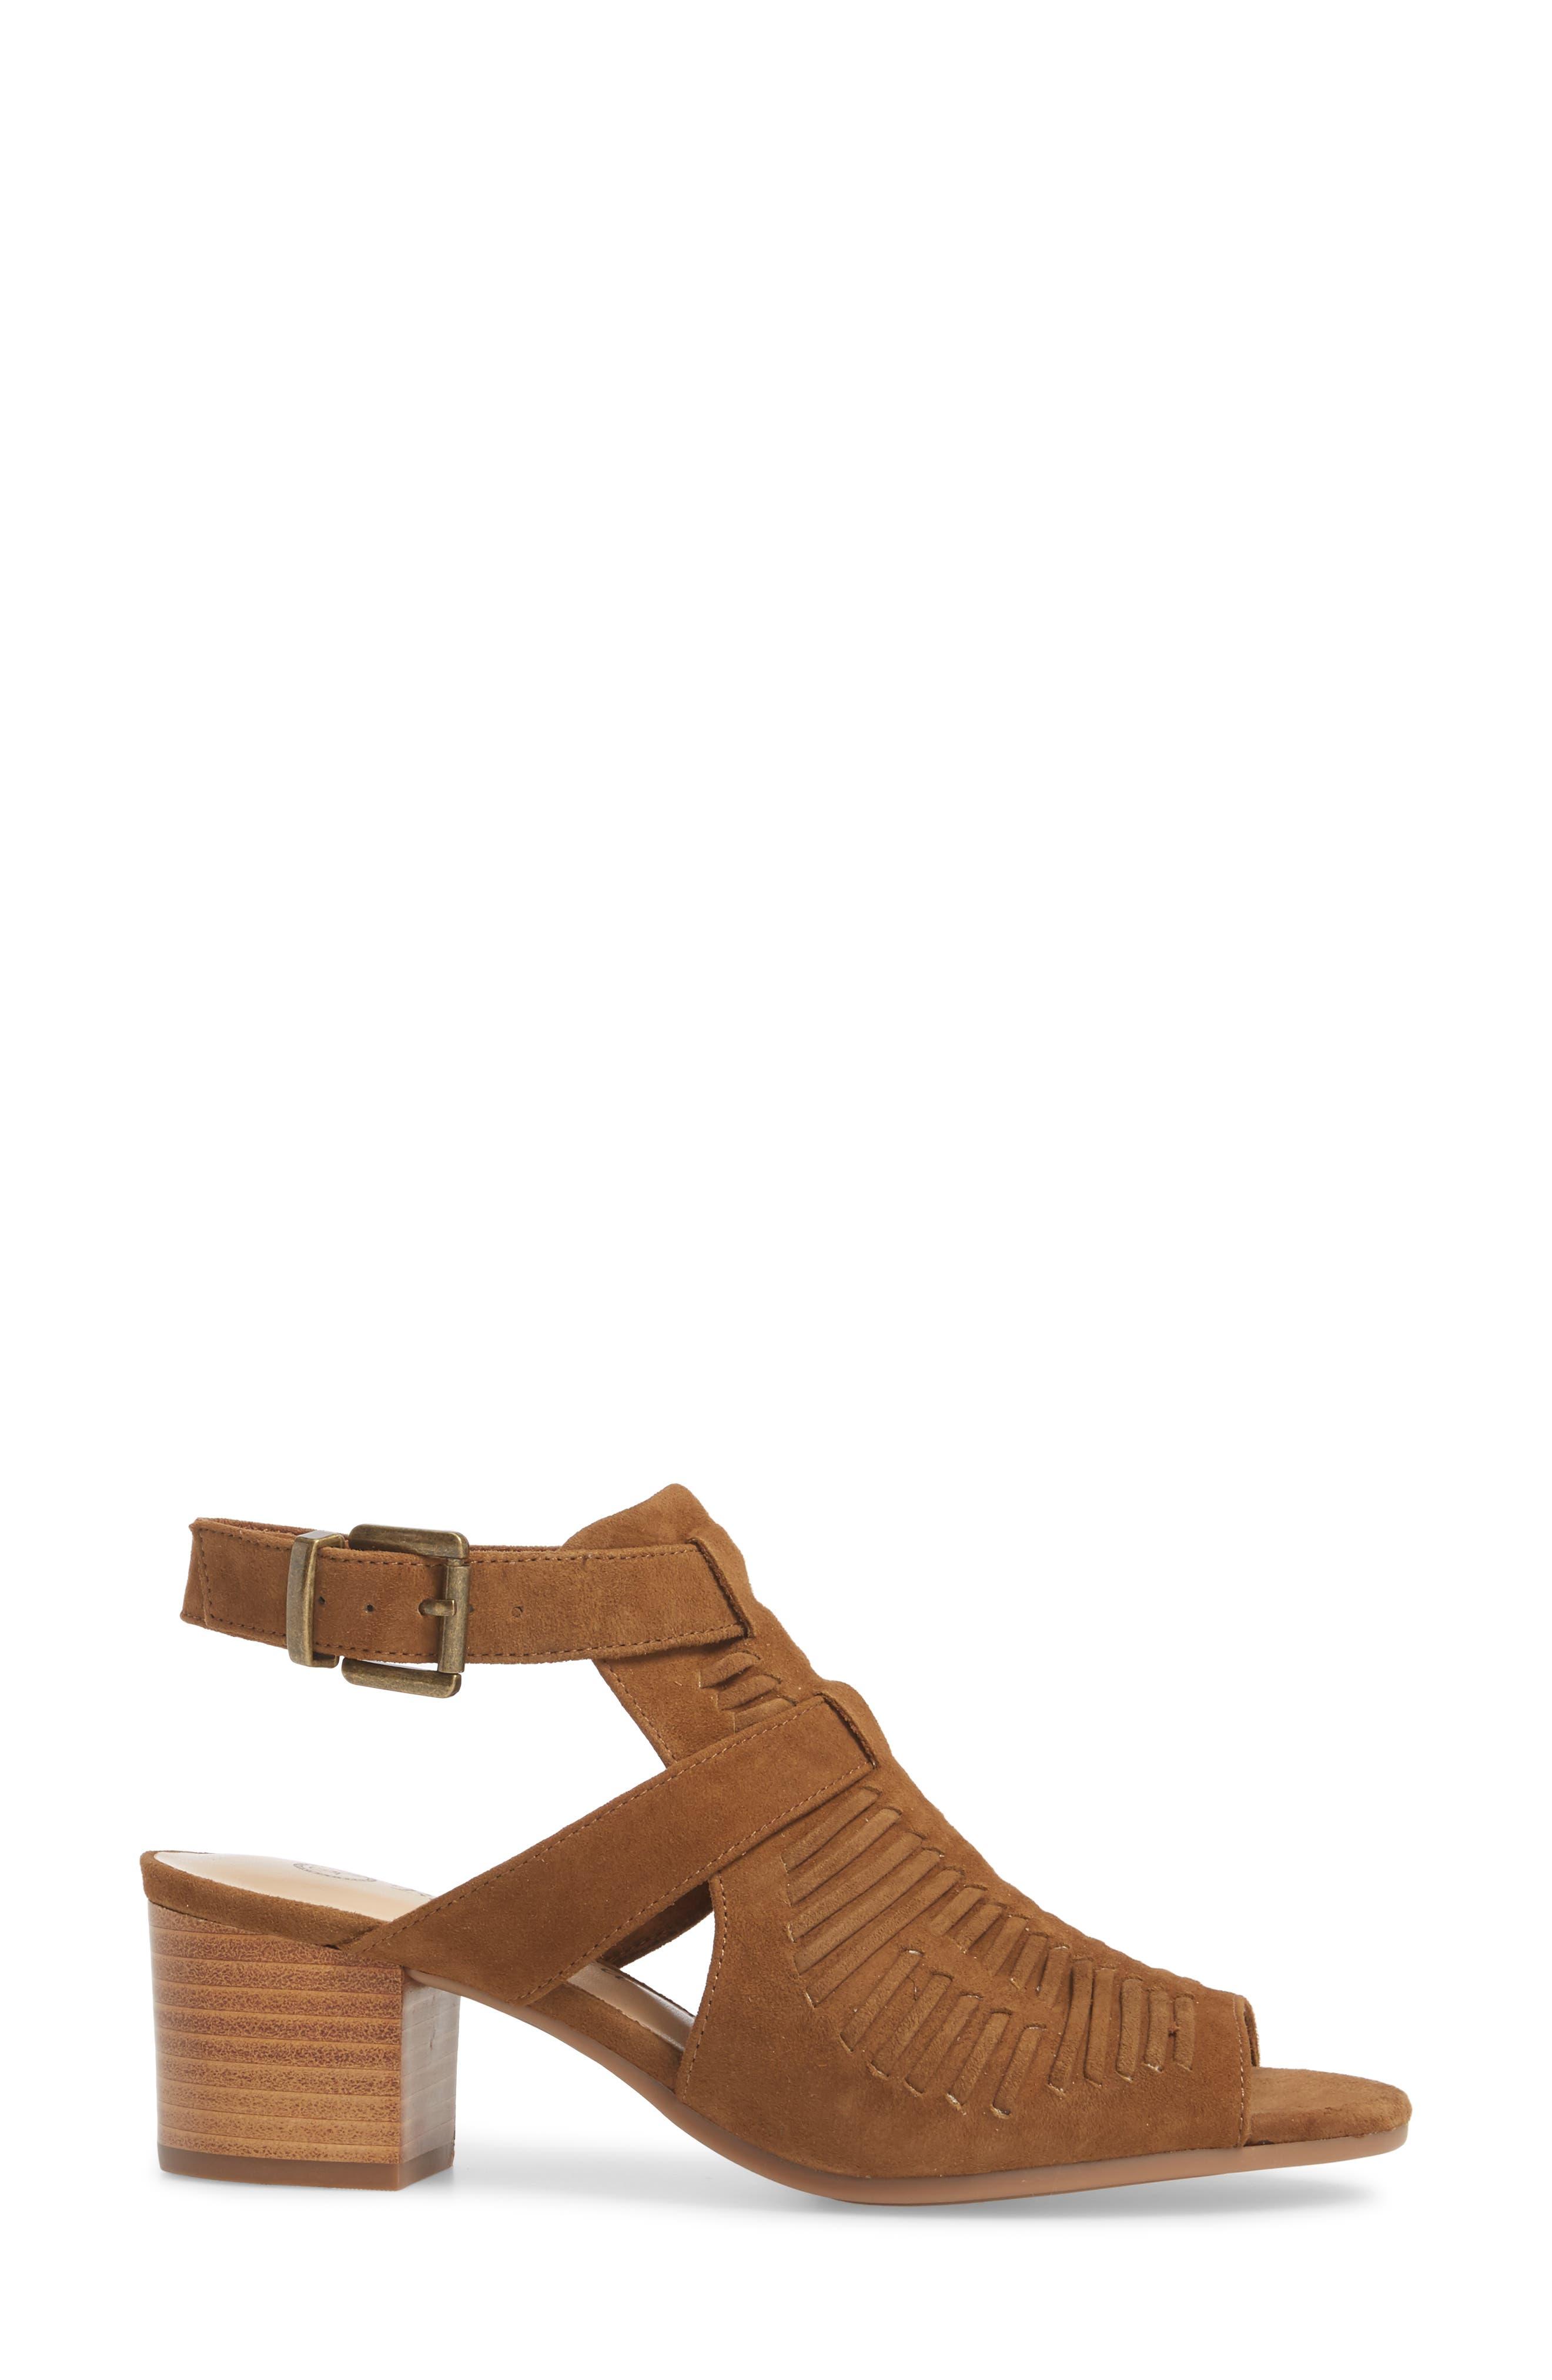 Finley Ankle Strap Sandal,                             Alternate thumbnail 12, color,